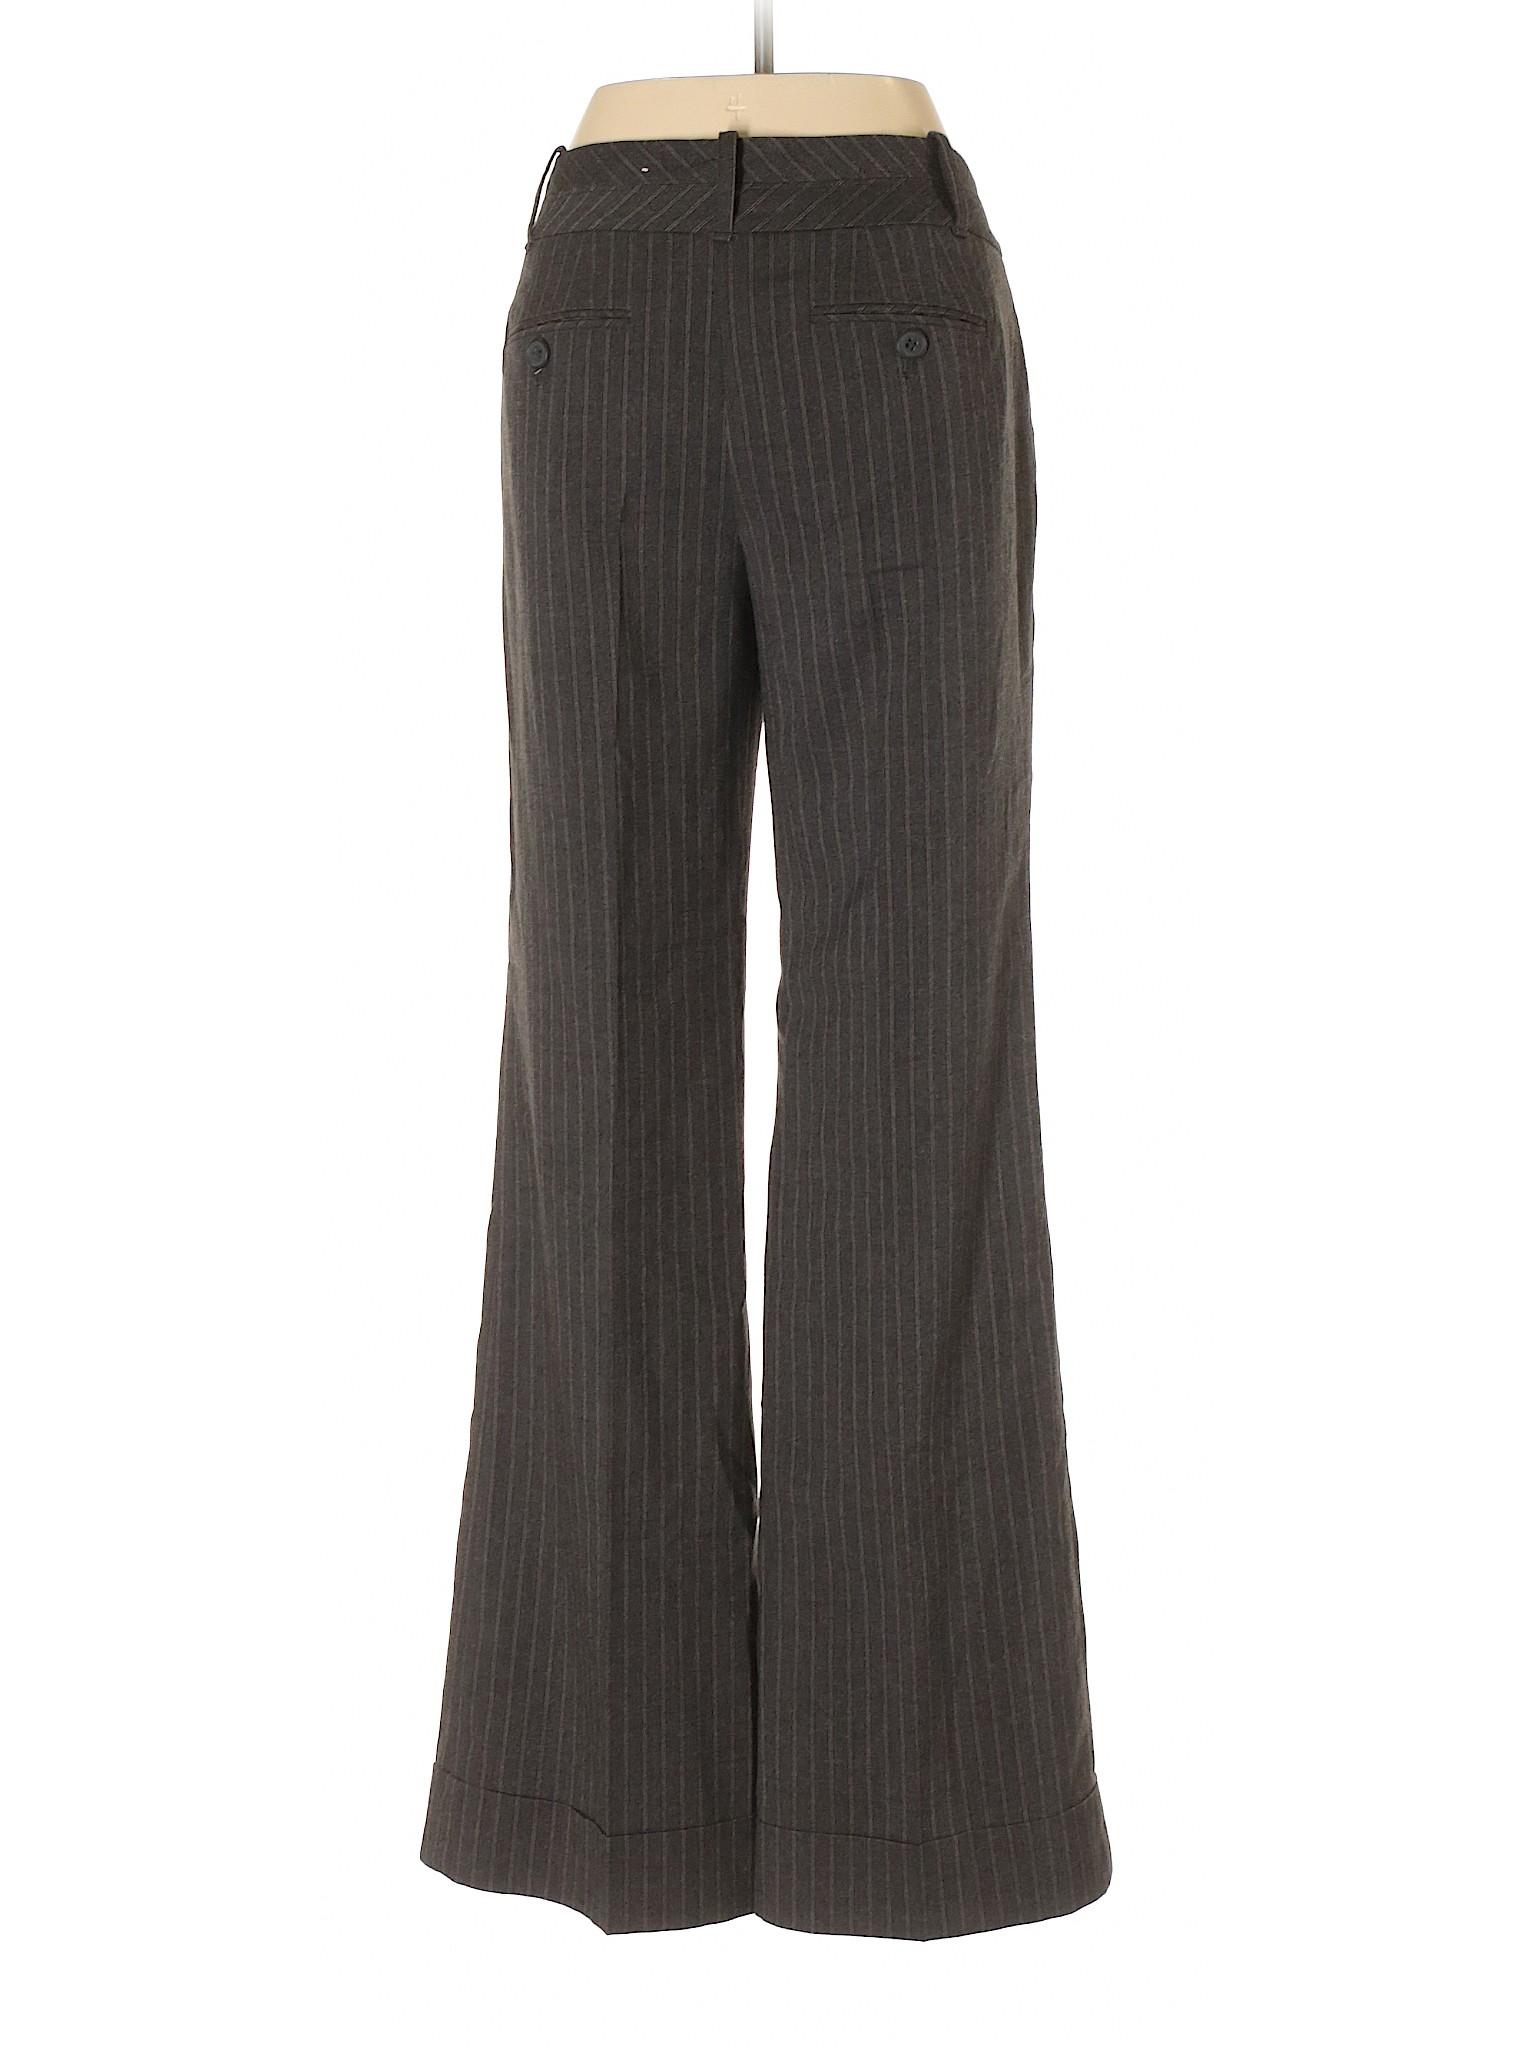 Ann Pants Taylor Boutique LOFT leisure Dress 1vwW5Hgcq